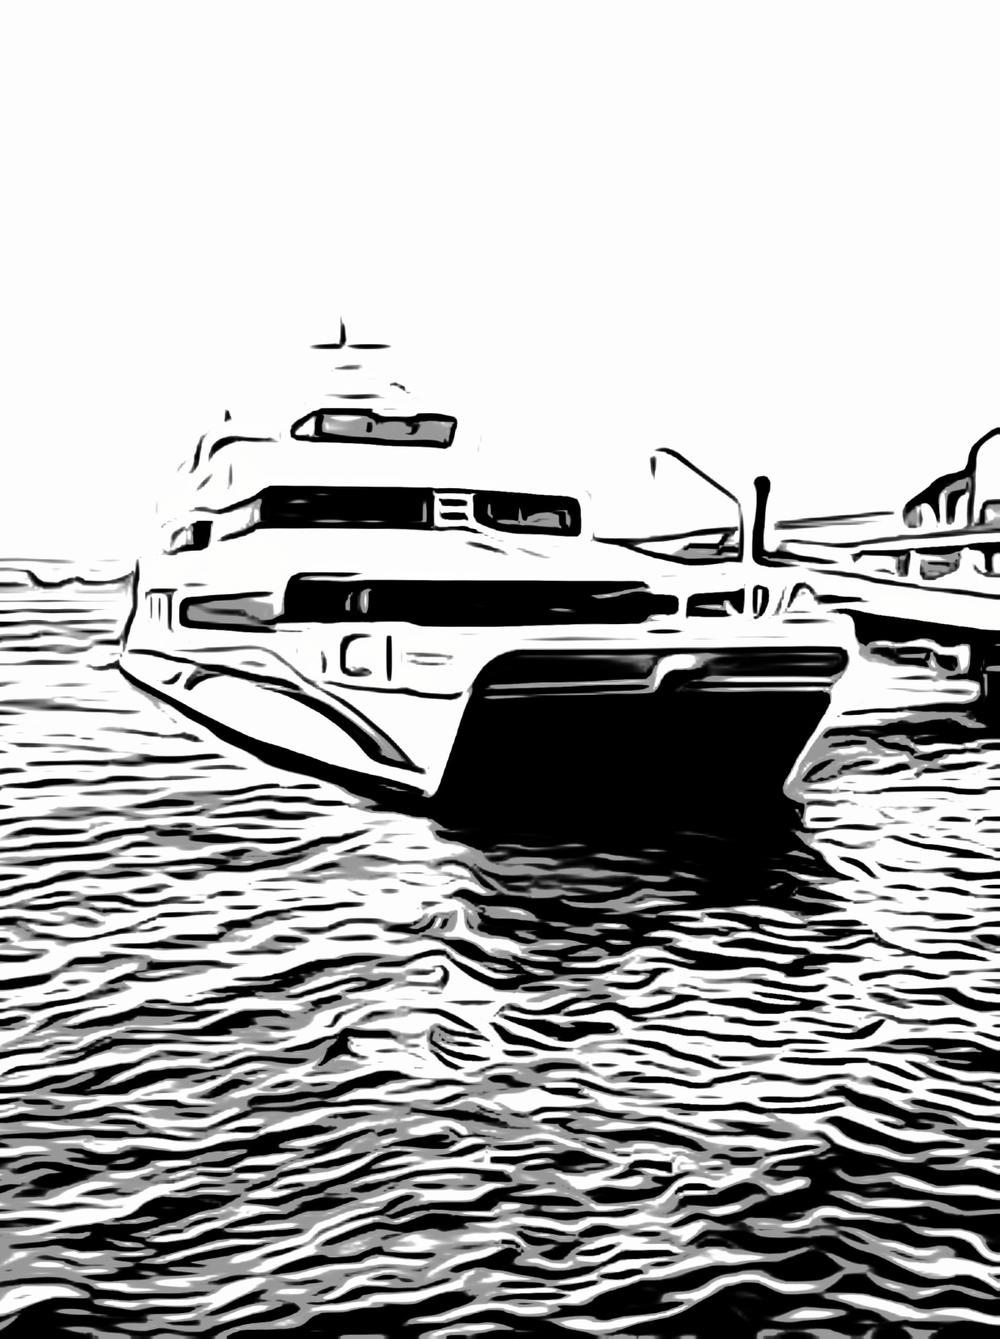 ship-041411.jpg